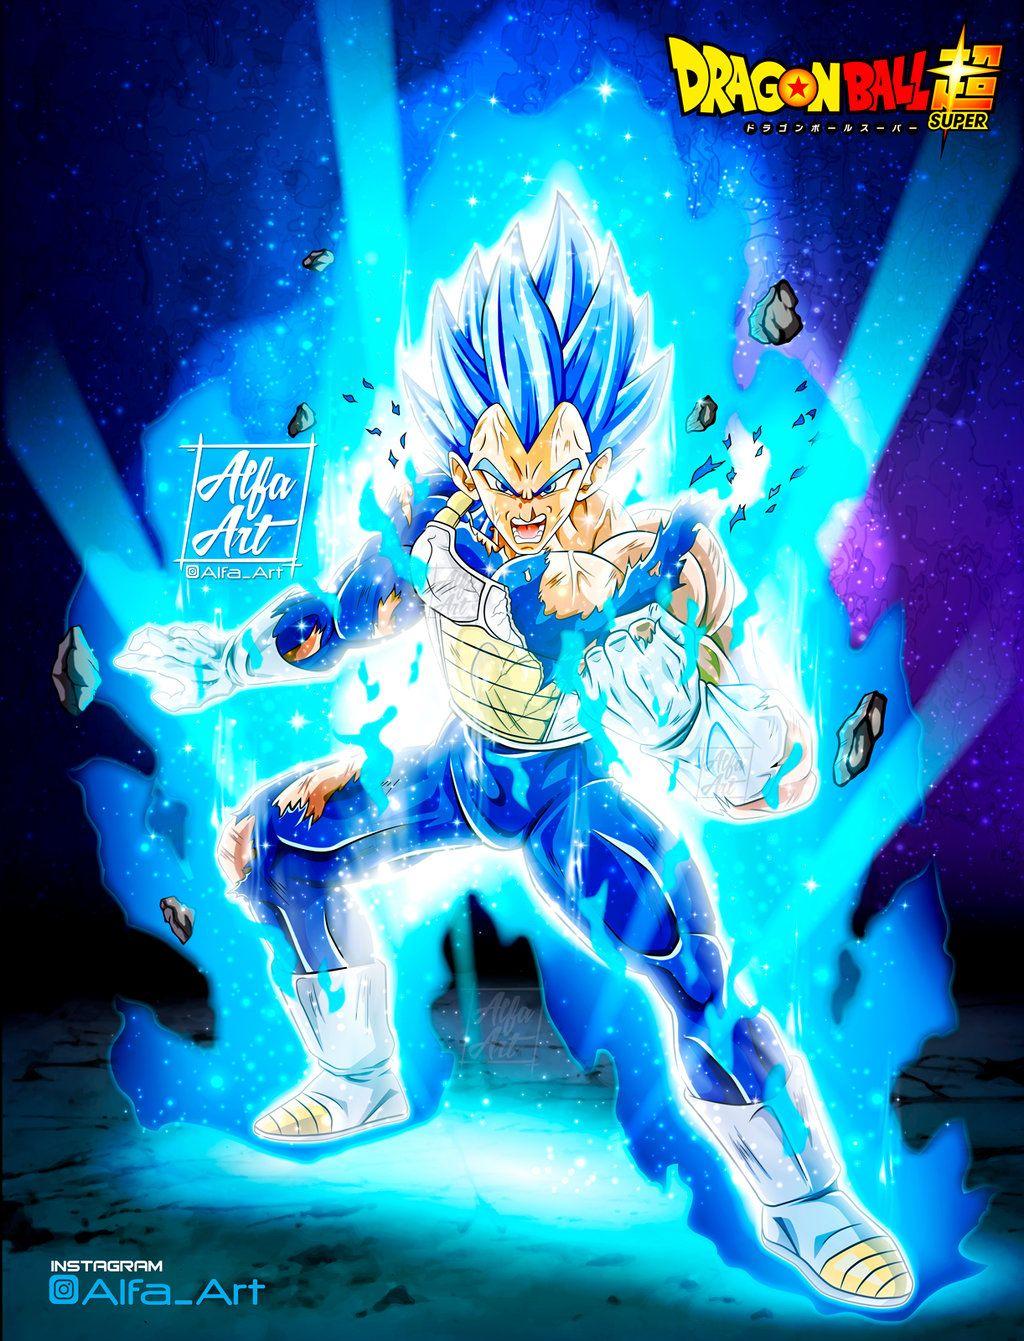 Wallpaper Vegeta Ssj Blue Evolution By Alfa Art Dragon Ball Super Manga Dragon Ball Super Wallpapers Dragon Ball Wallpapers